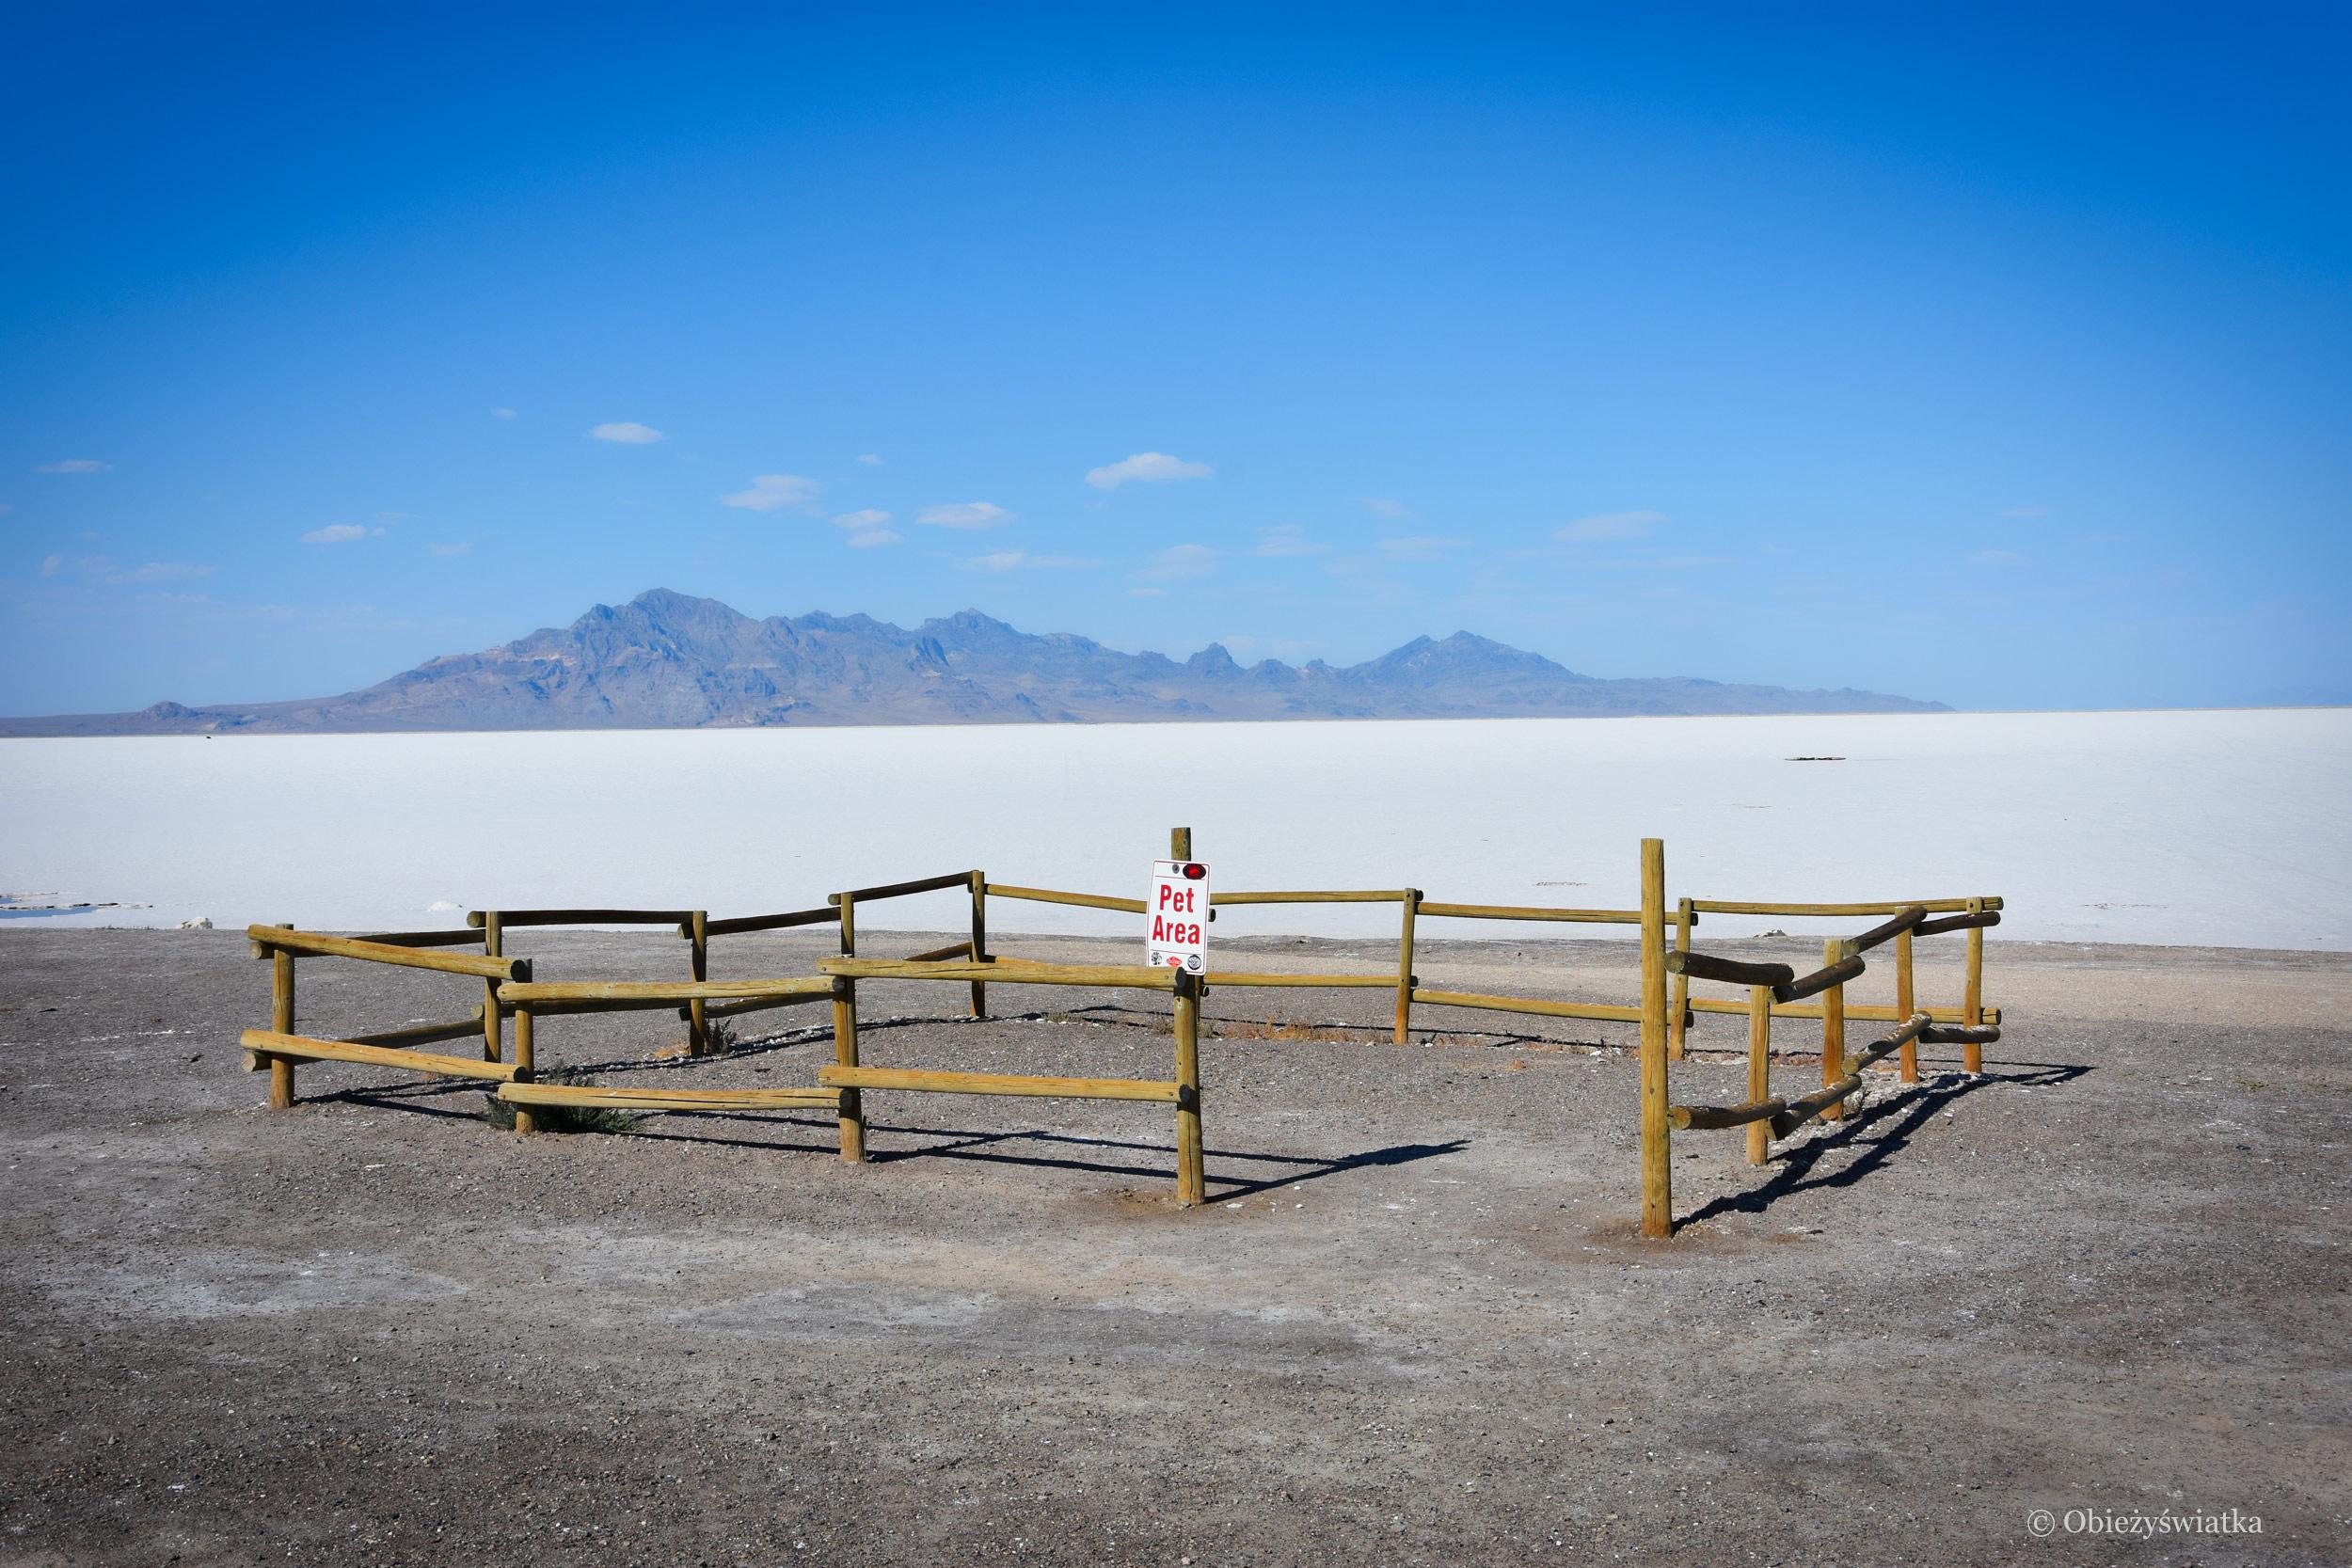 Z myślą o czworonogach ... - Great Salt Lake Desert